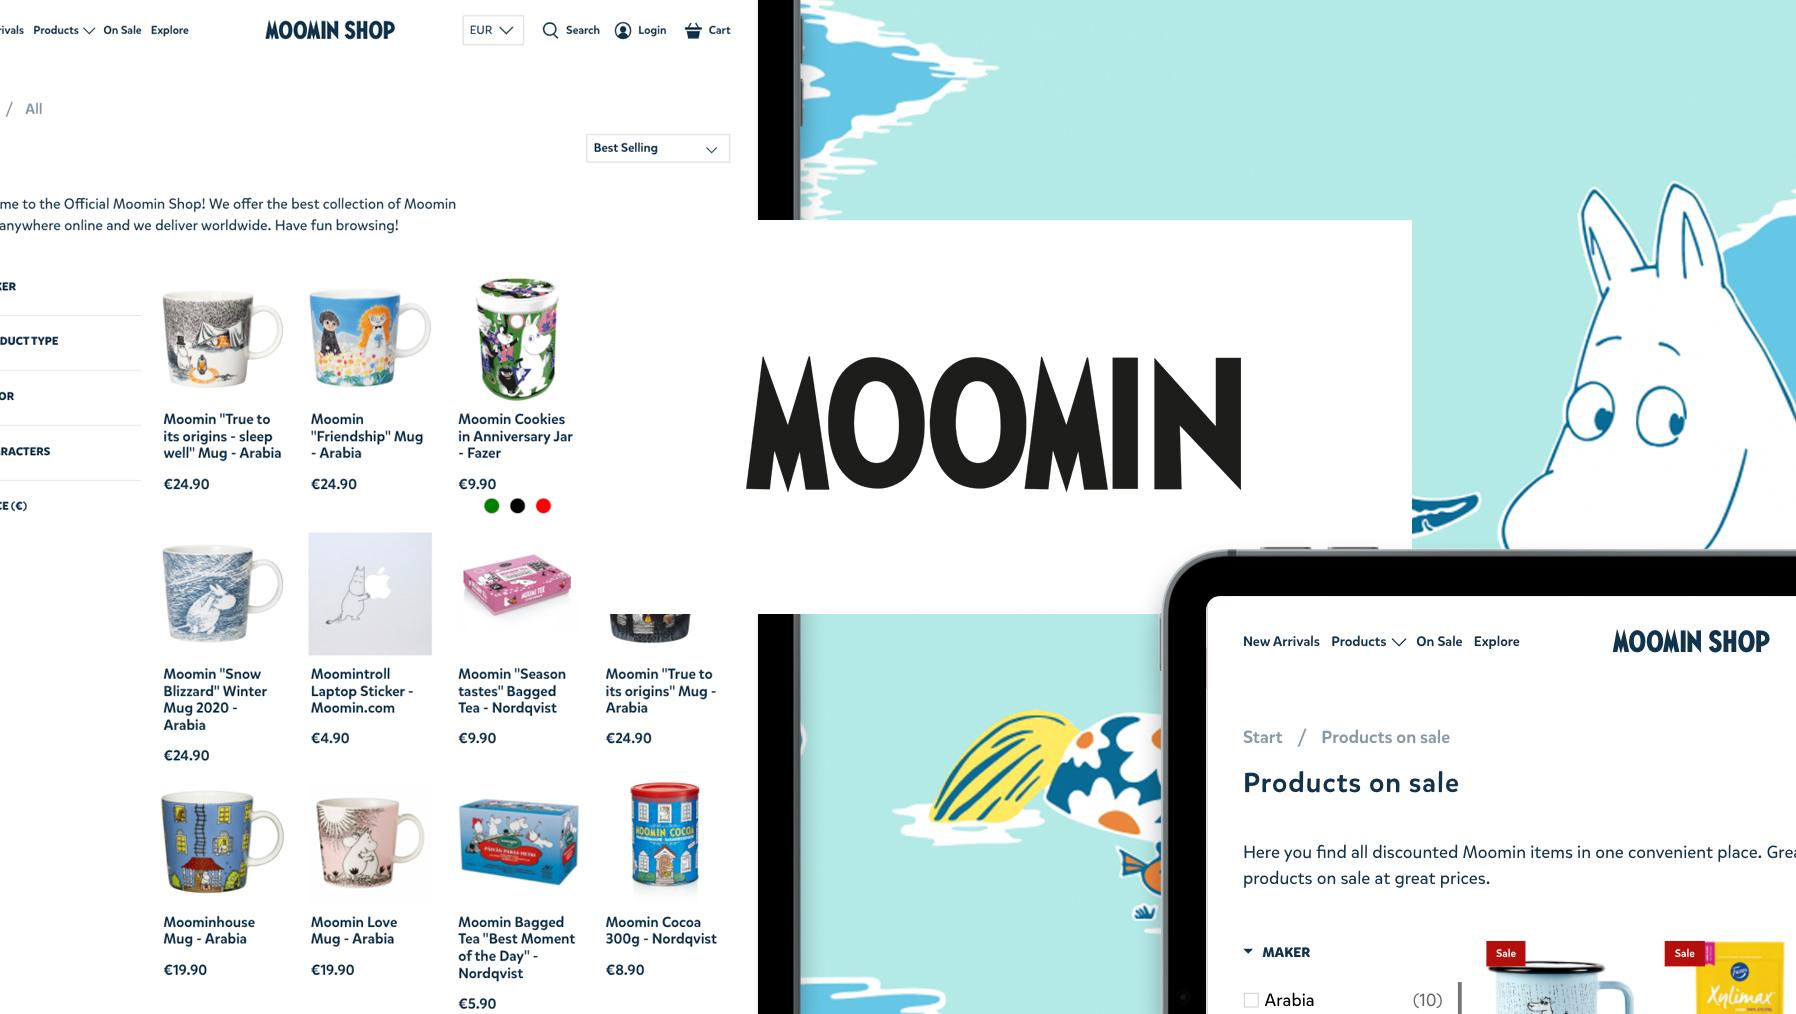 Moomin PIM Case Study